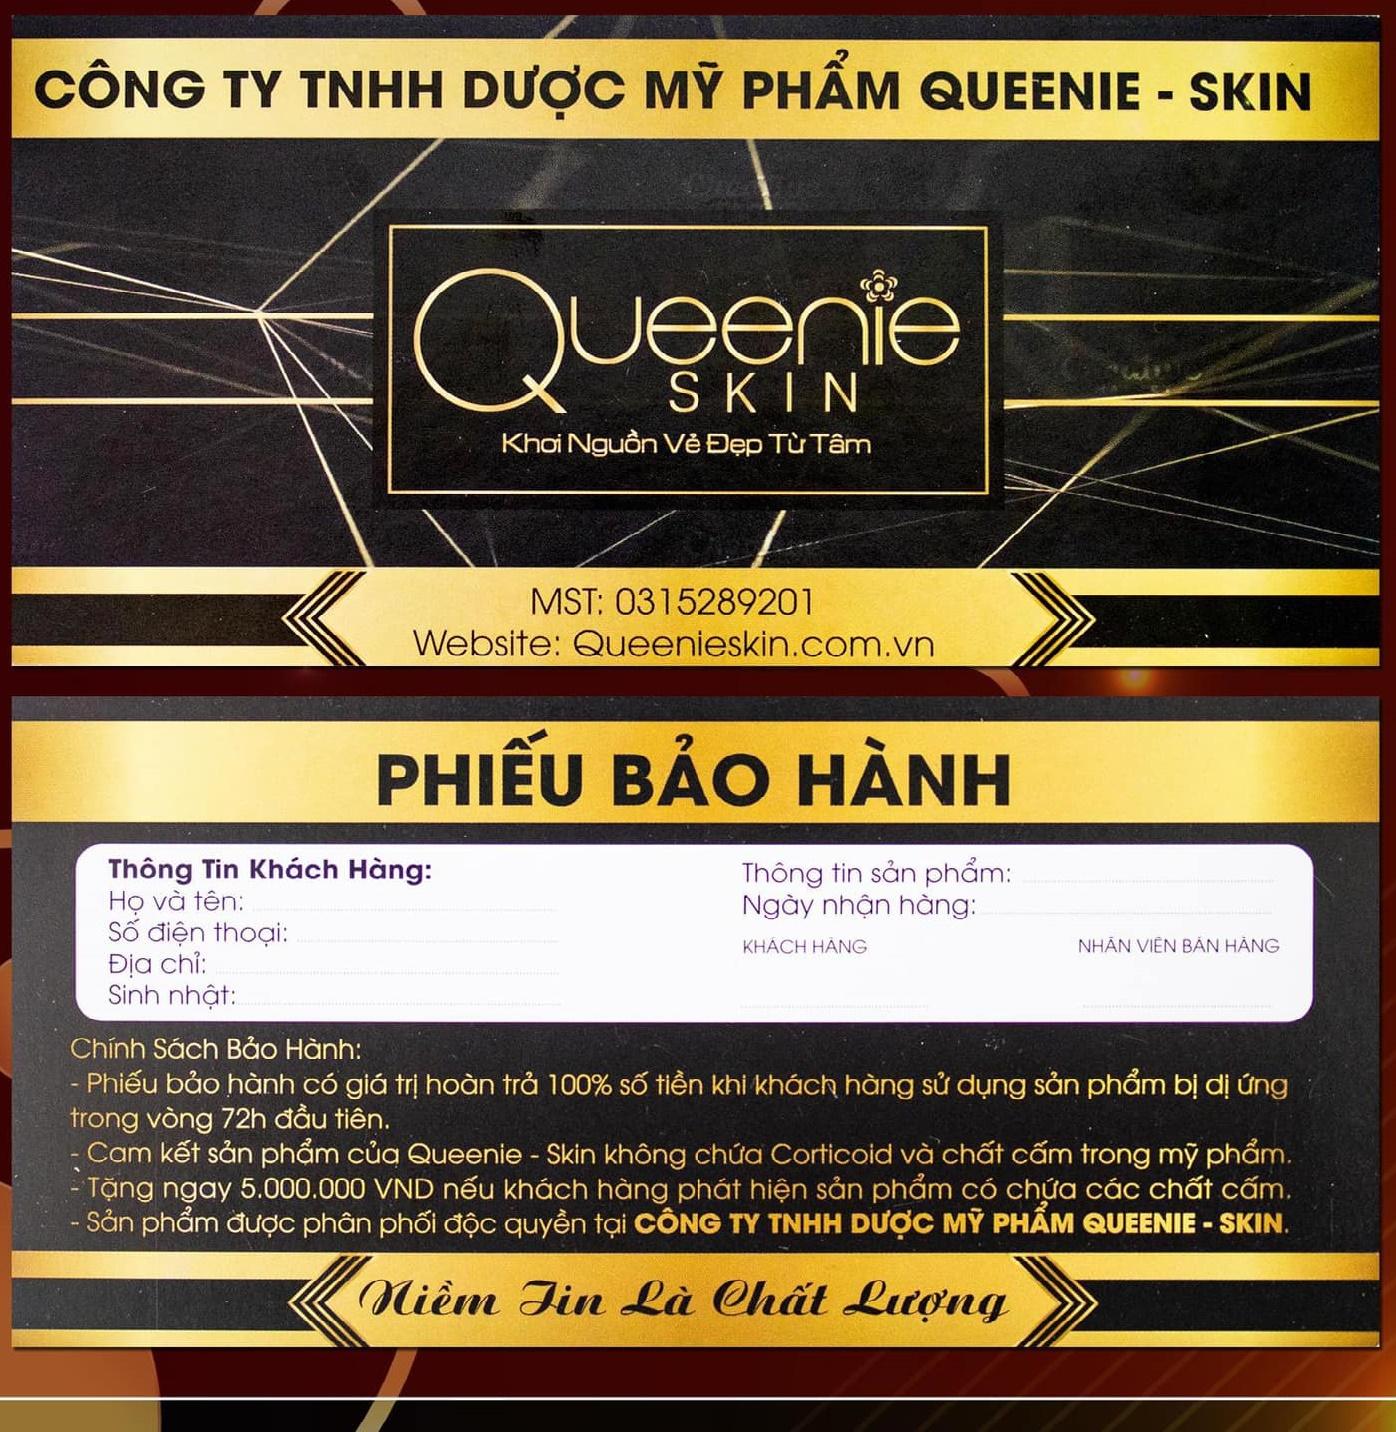 mỹ phẩm queenie skin